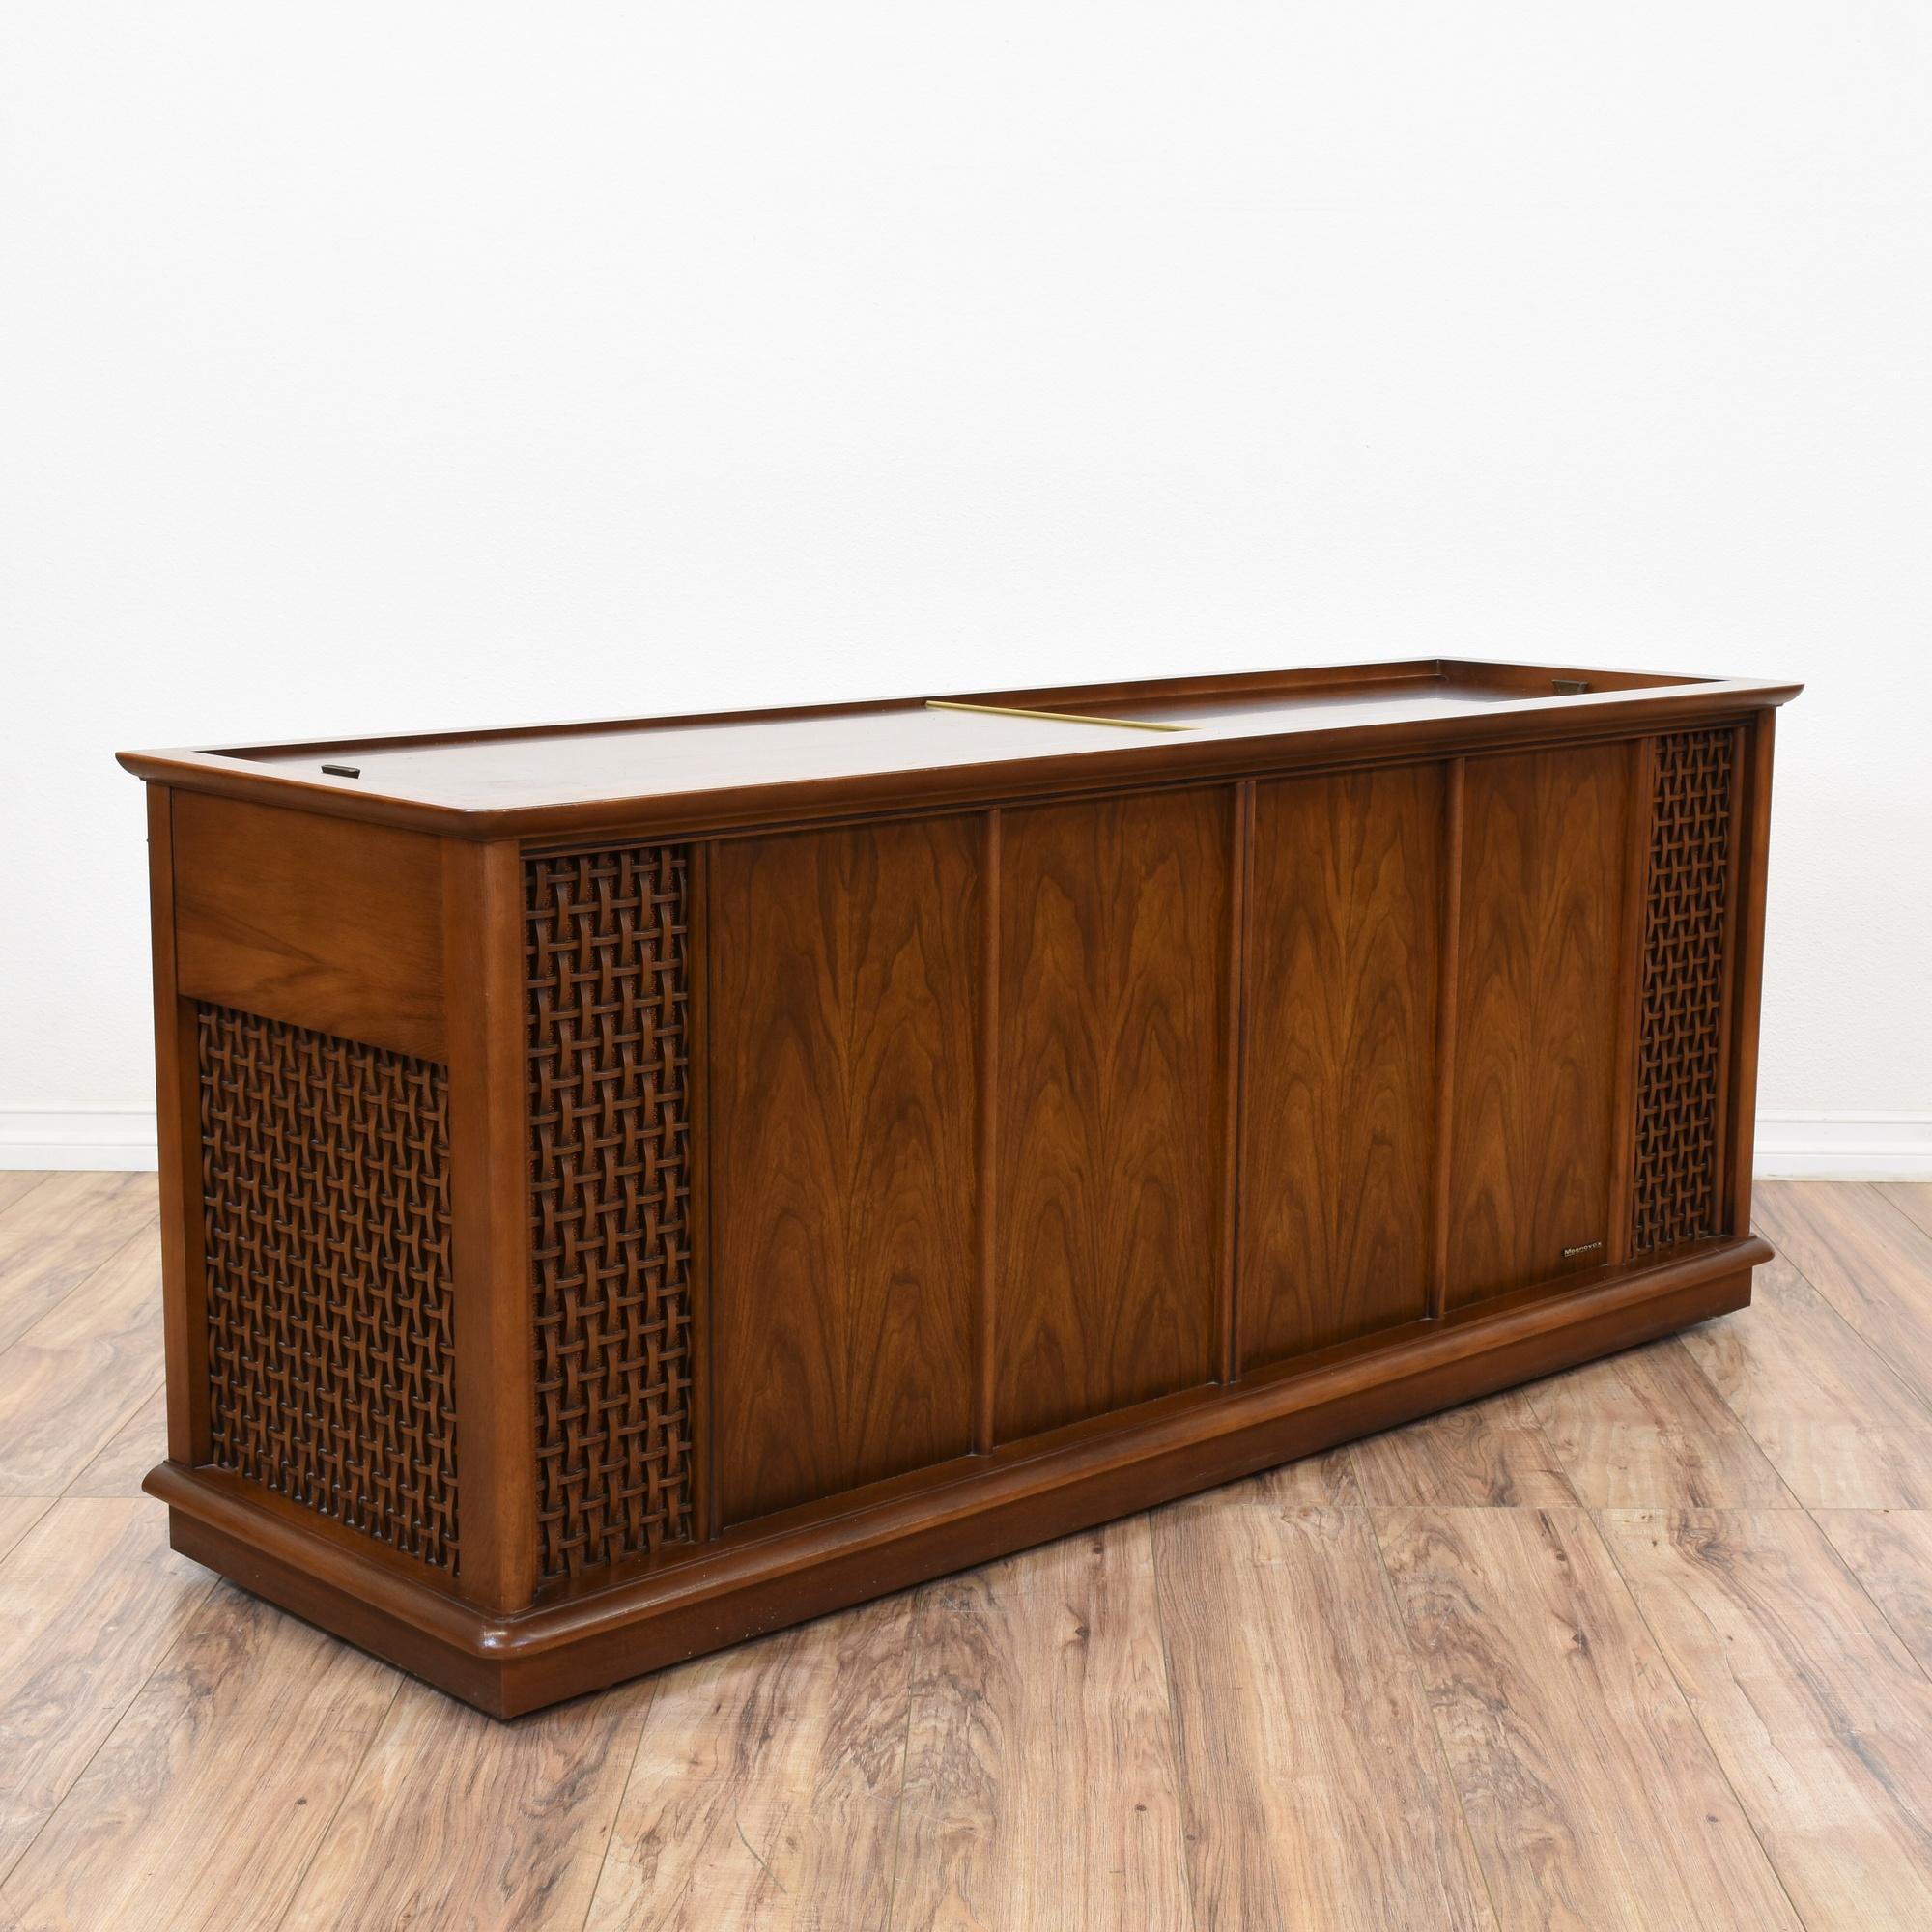 en cabinet amplifier id of original stereo david retro duggleby auction scarborough gb catalogues system ferguson hi lot fi catalogue vintage comprising